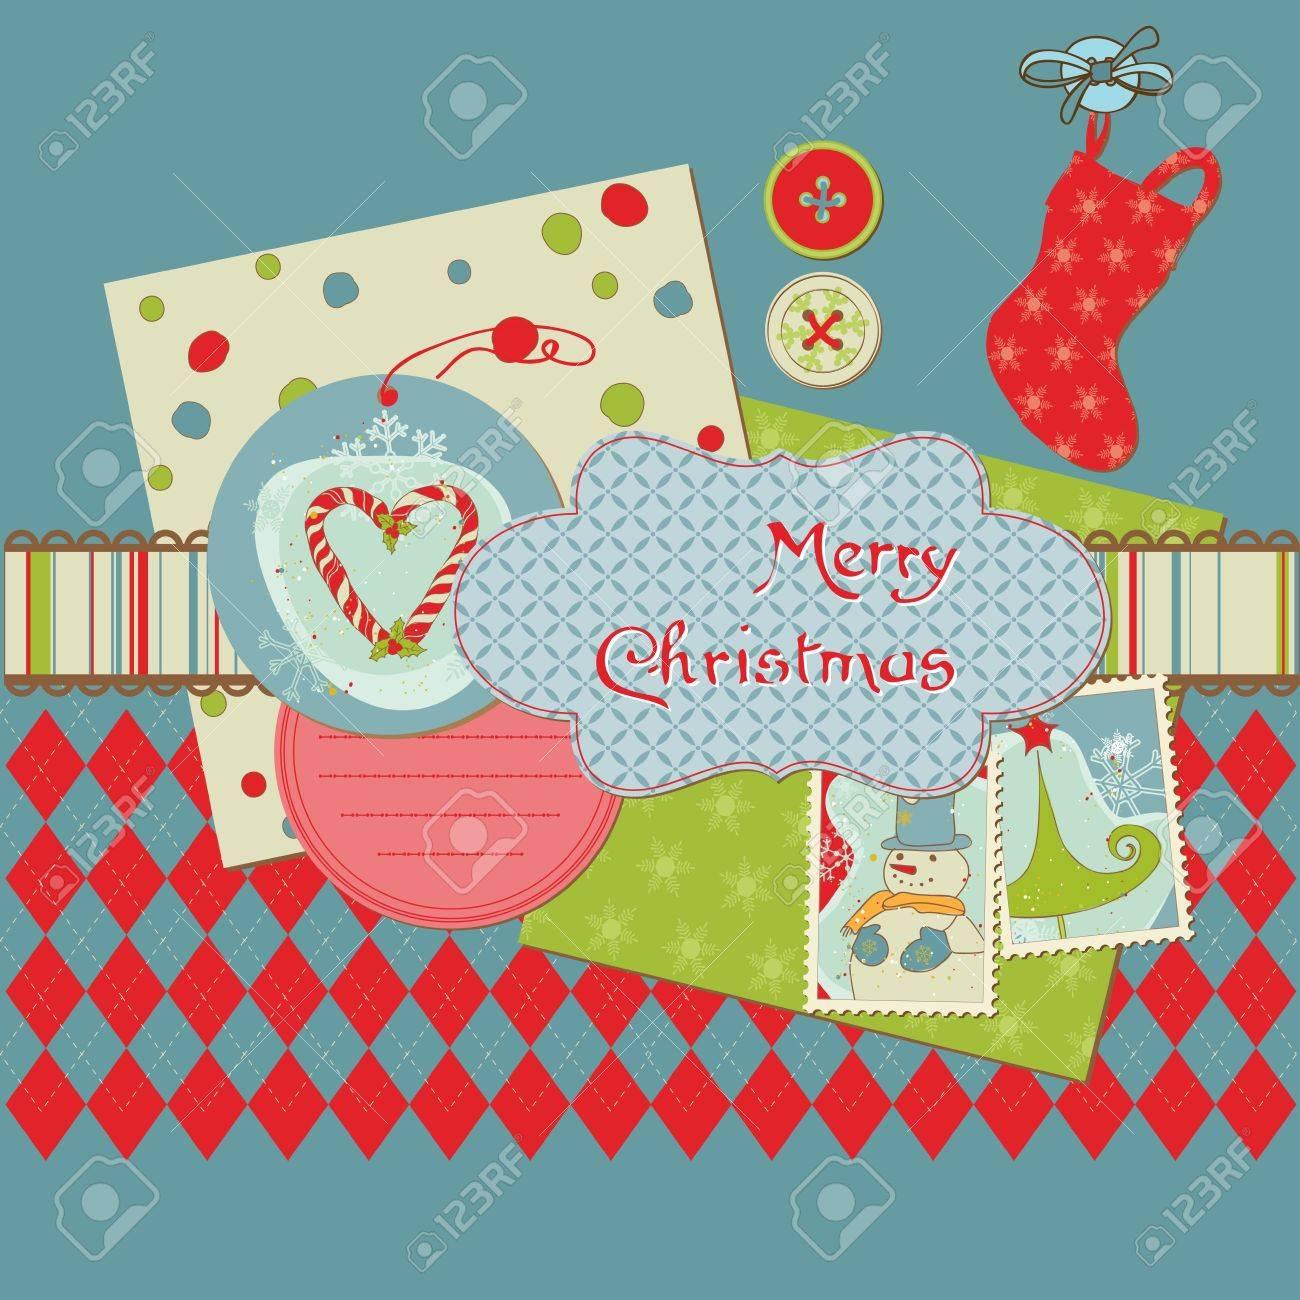 Christmas Design Elements - for scrapbook, design, invitation, greetings Stock Vector - 11480510